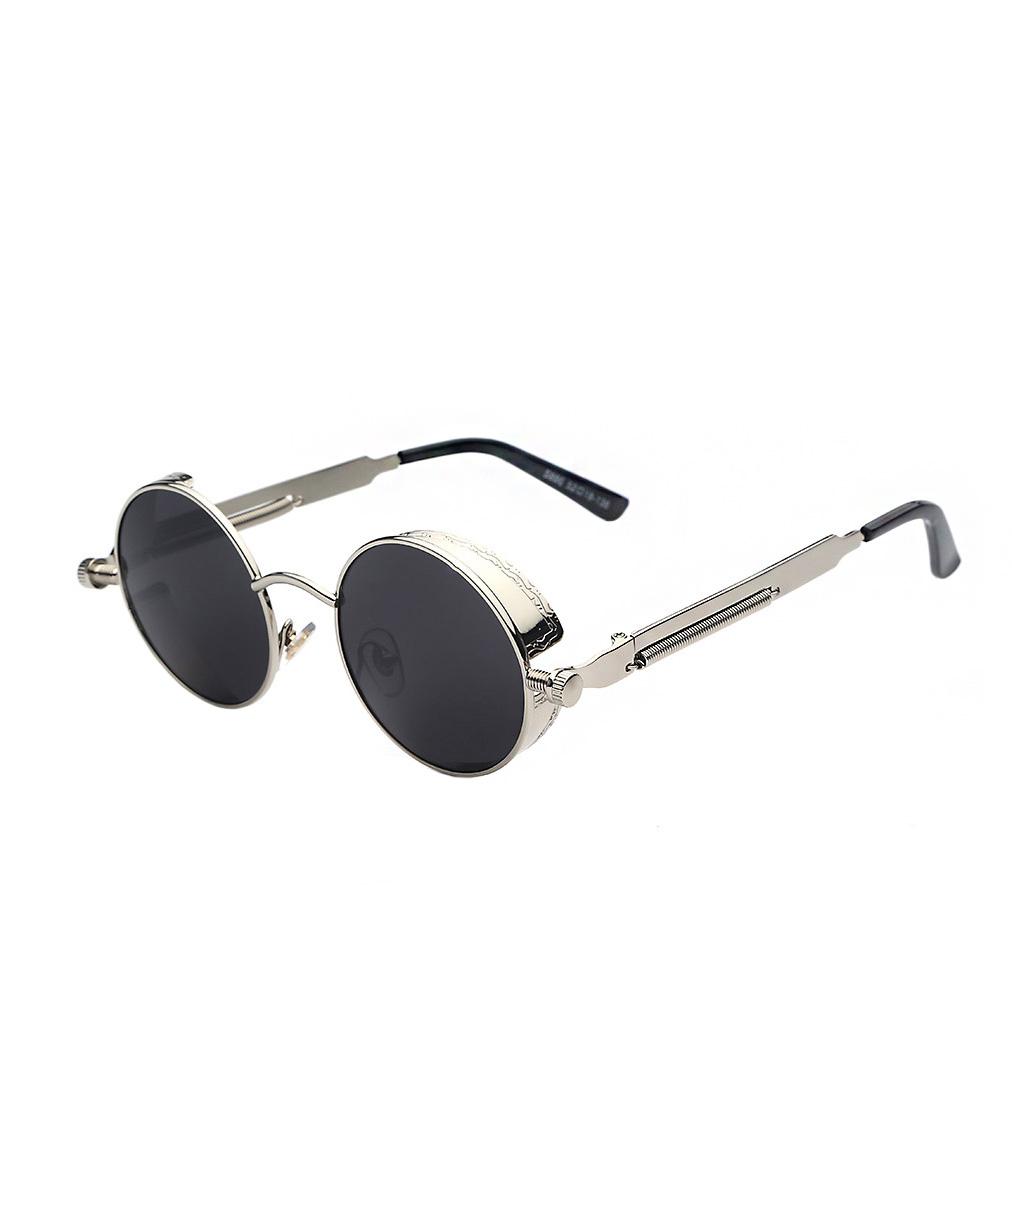 a971d87b68e01 Glasses round silver glasses black